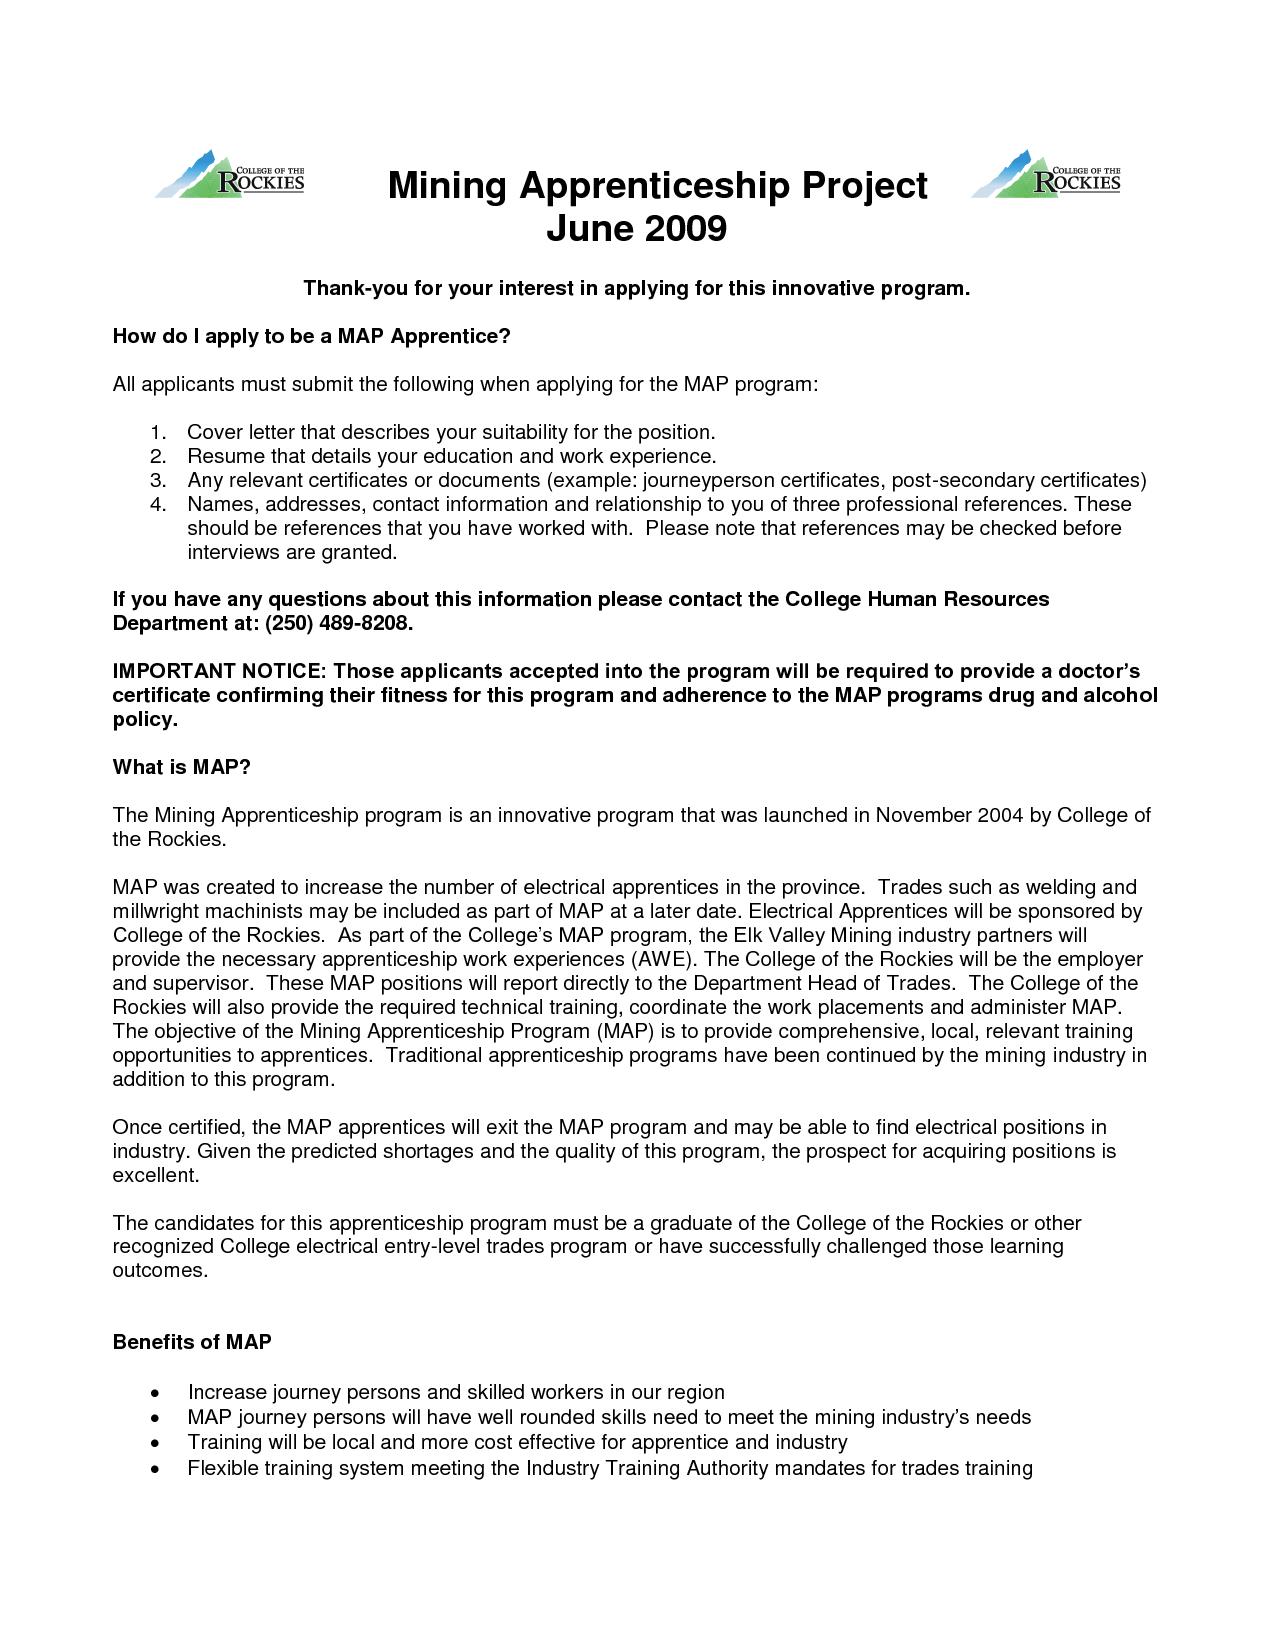 apprenticeship essay example apprentice plumber cover letter ...